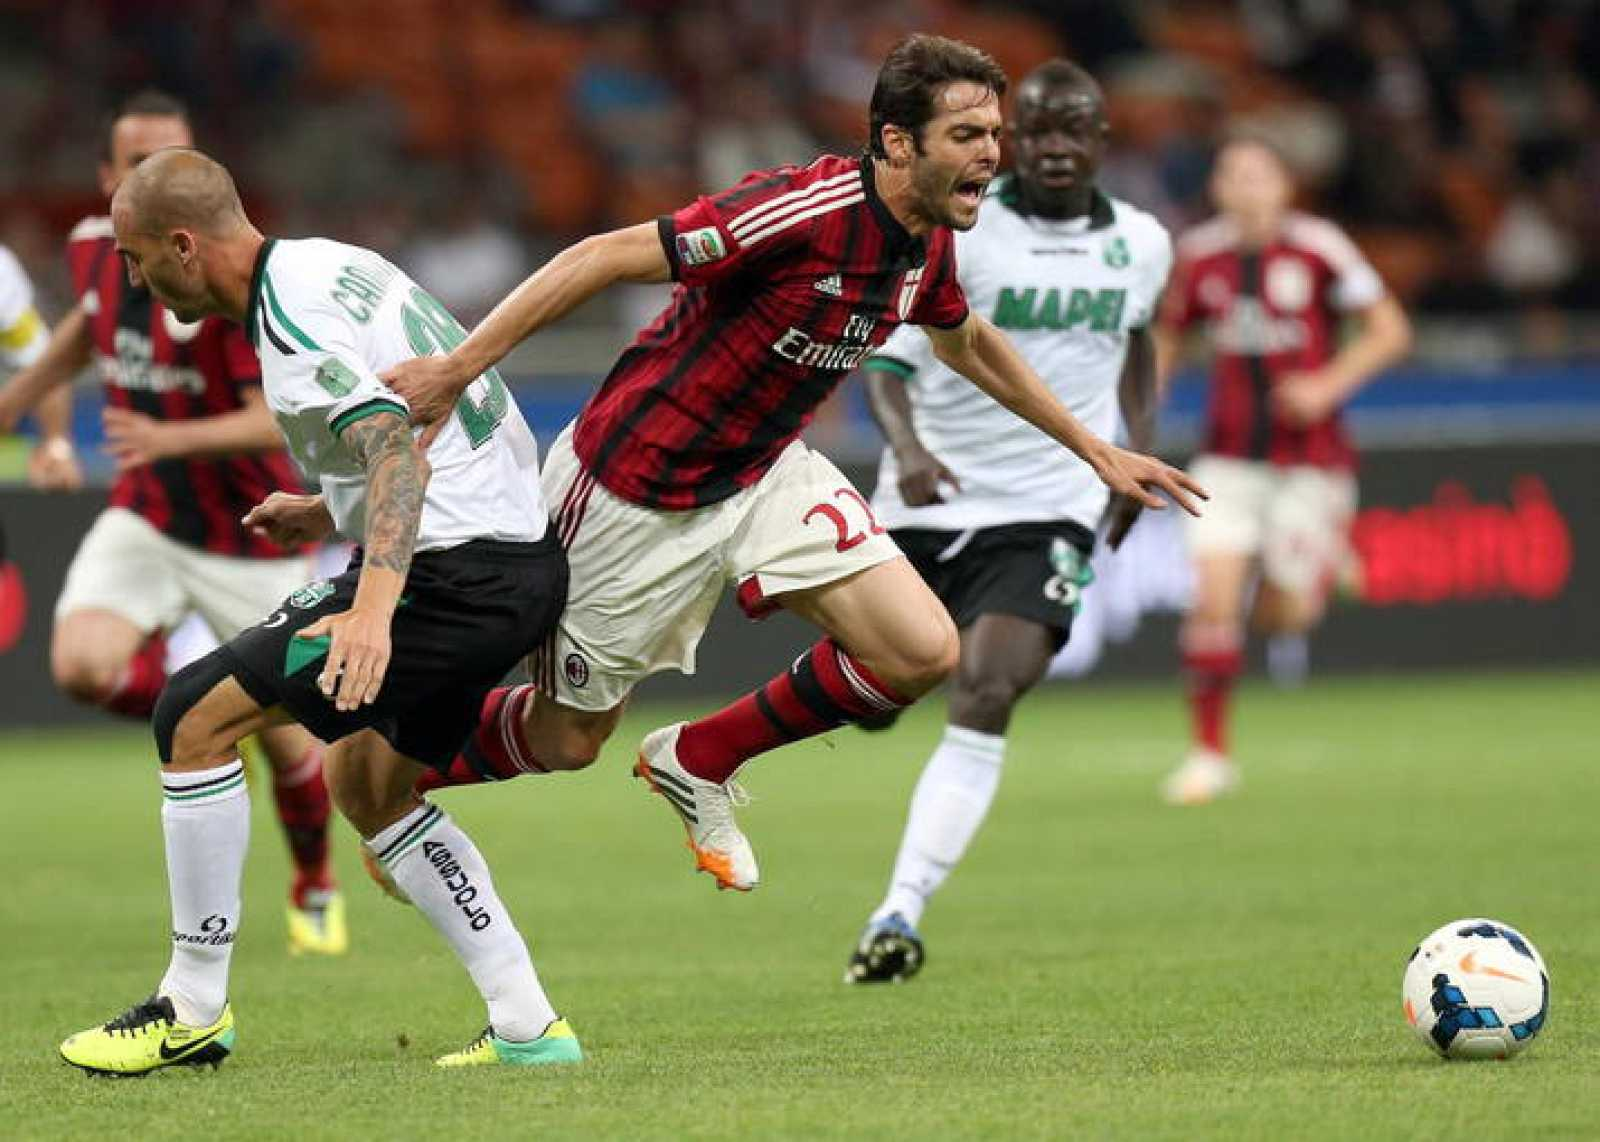 AC Milan vs US Sassuolo Calcio